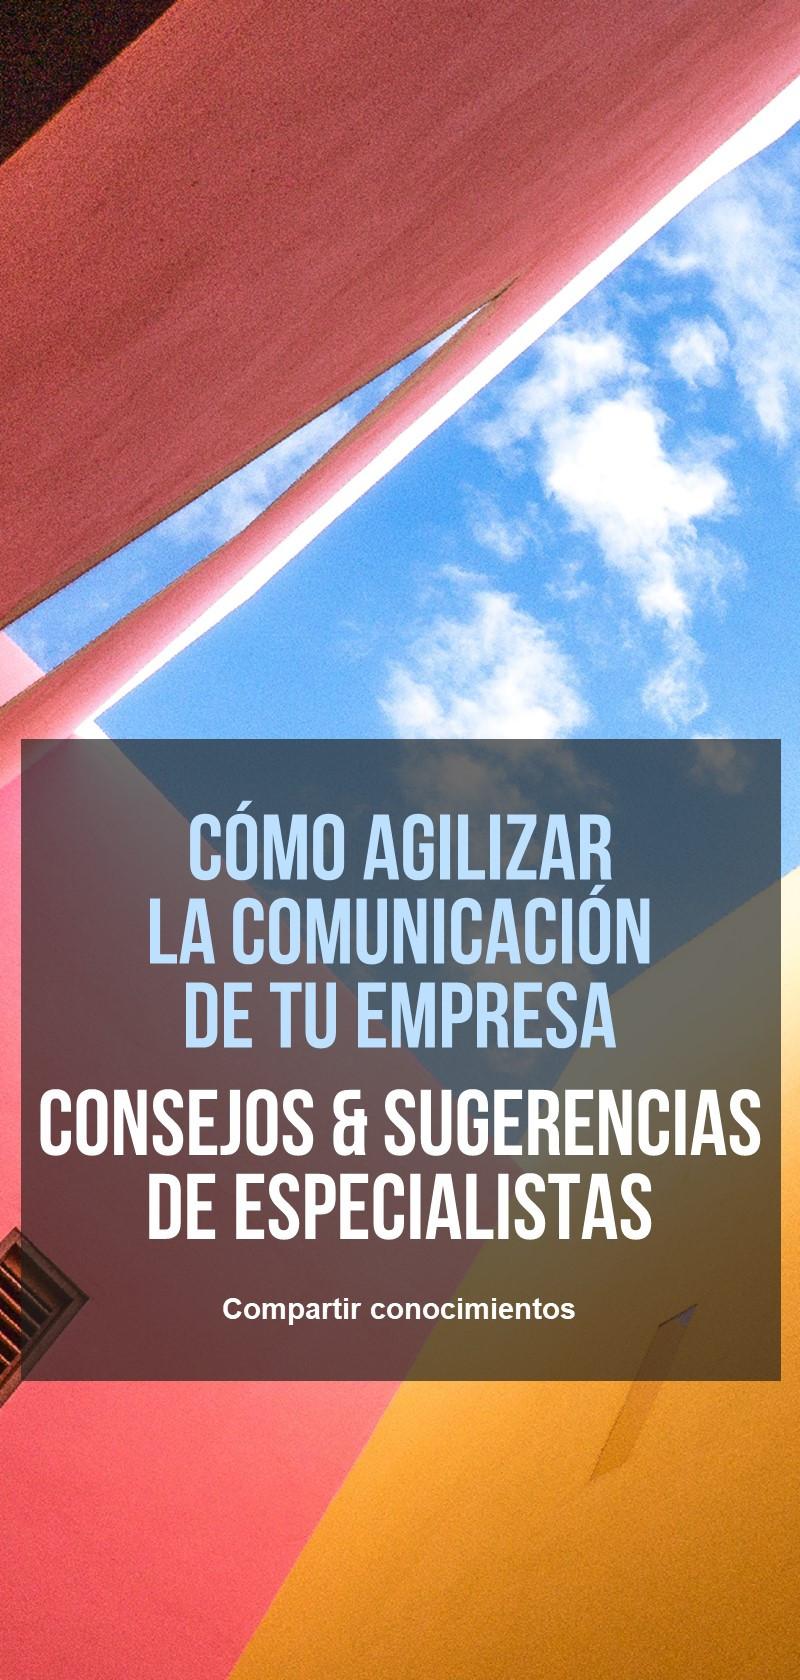 Cursos & consultores de comunicación empresarial